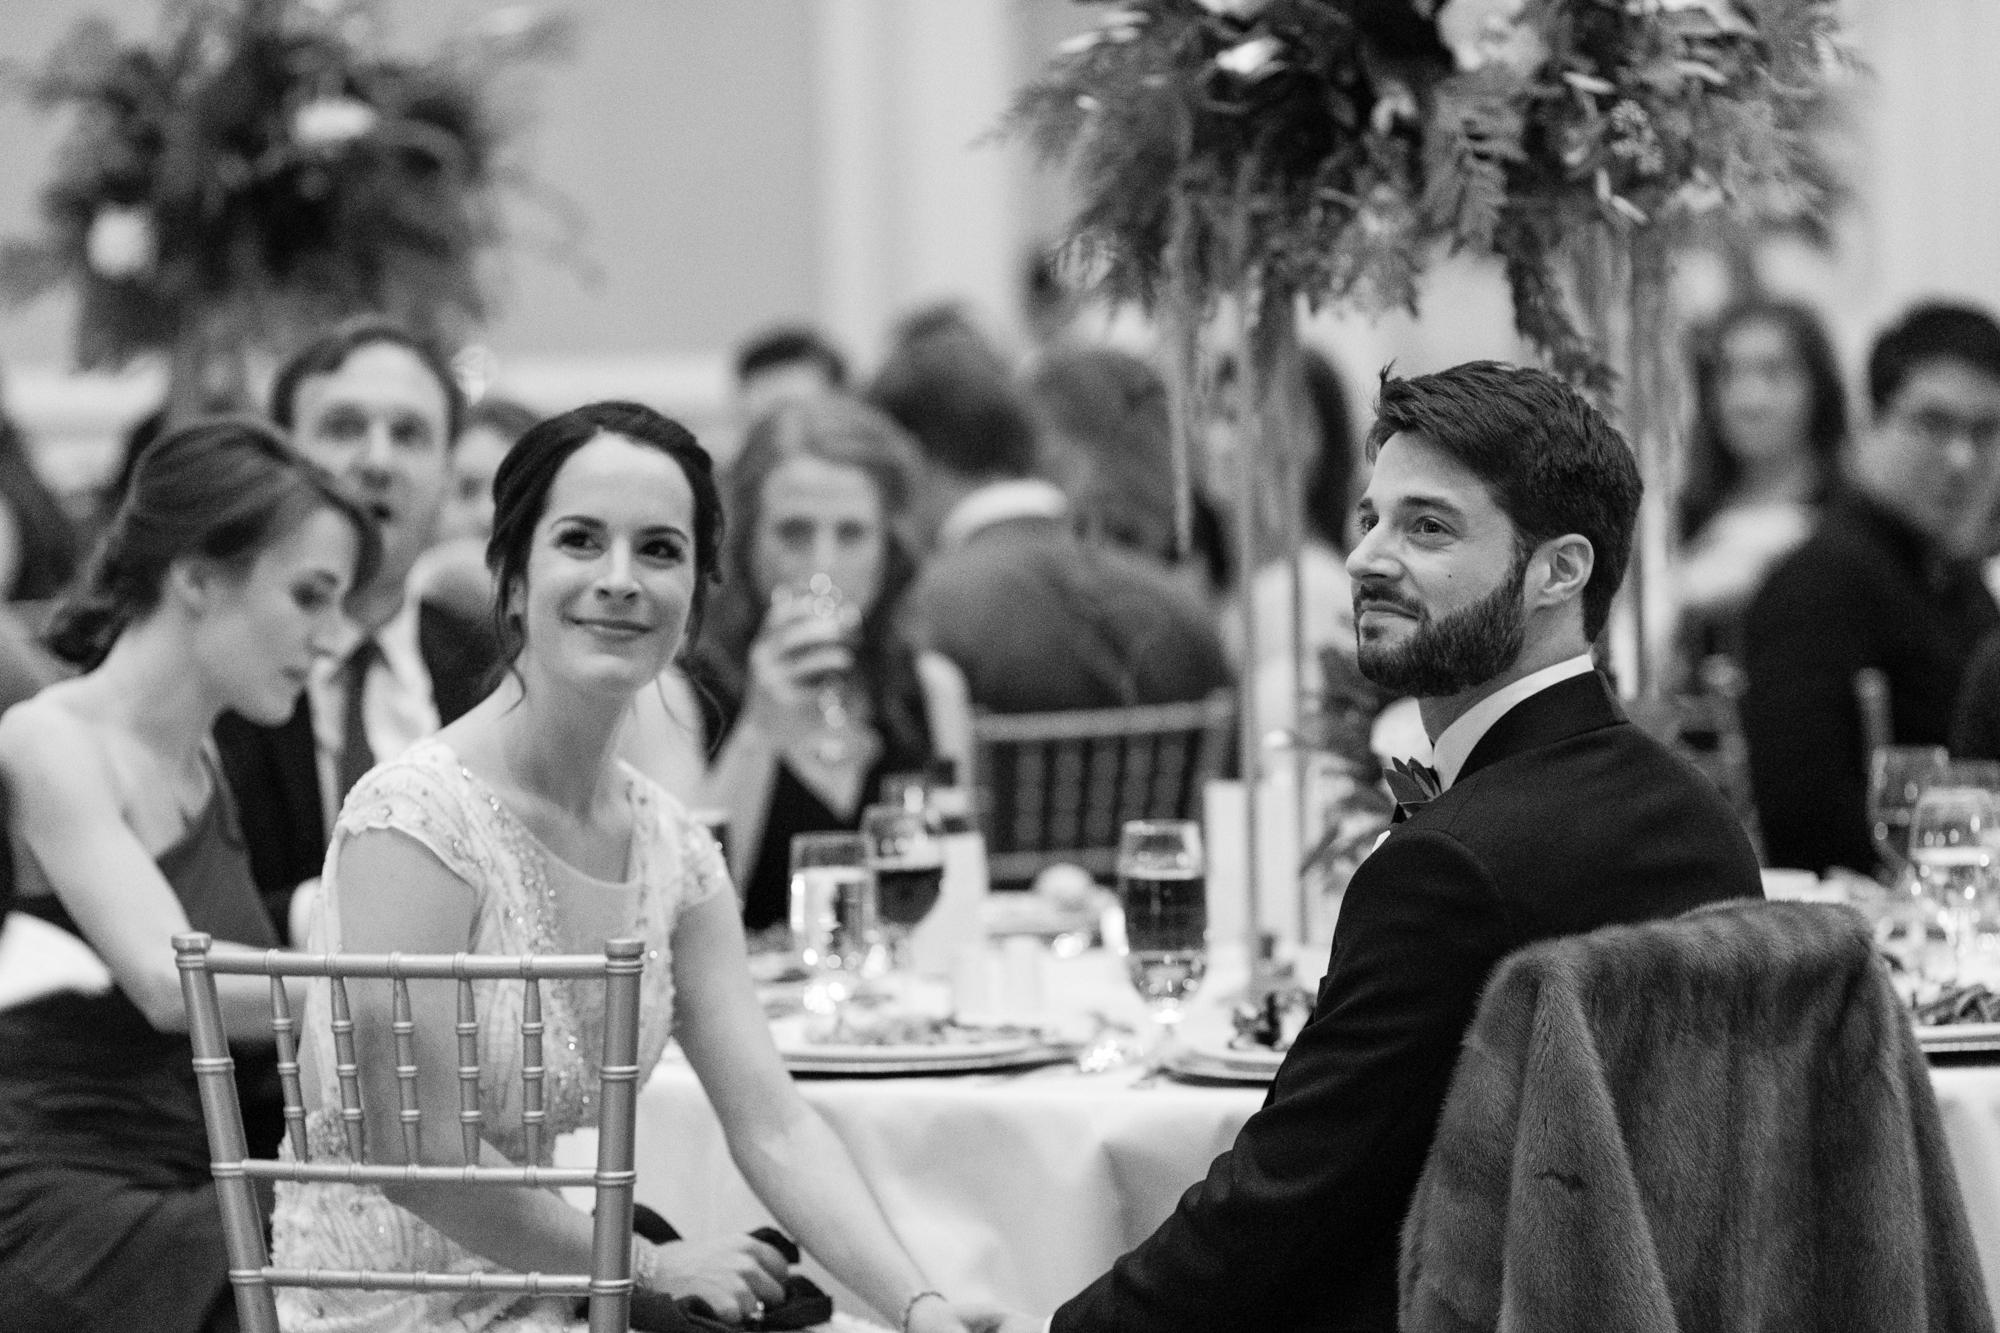 grand-america-winter-wedding-33.jpg